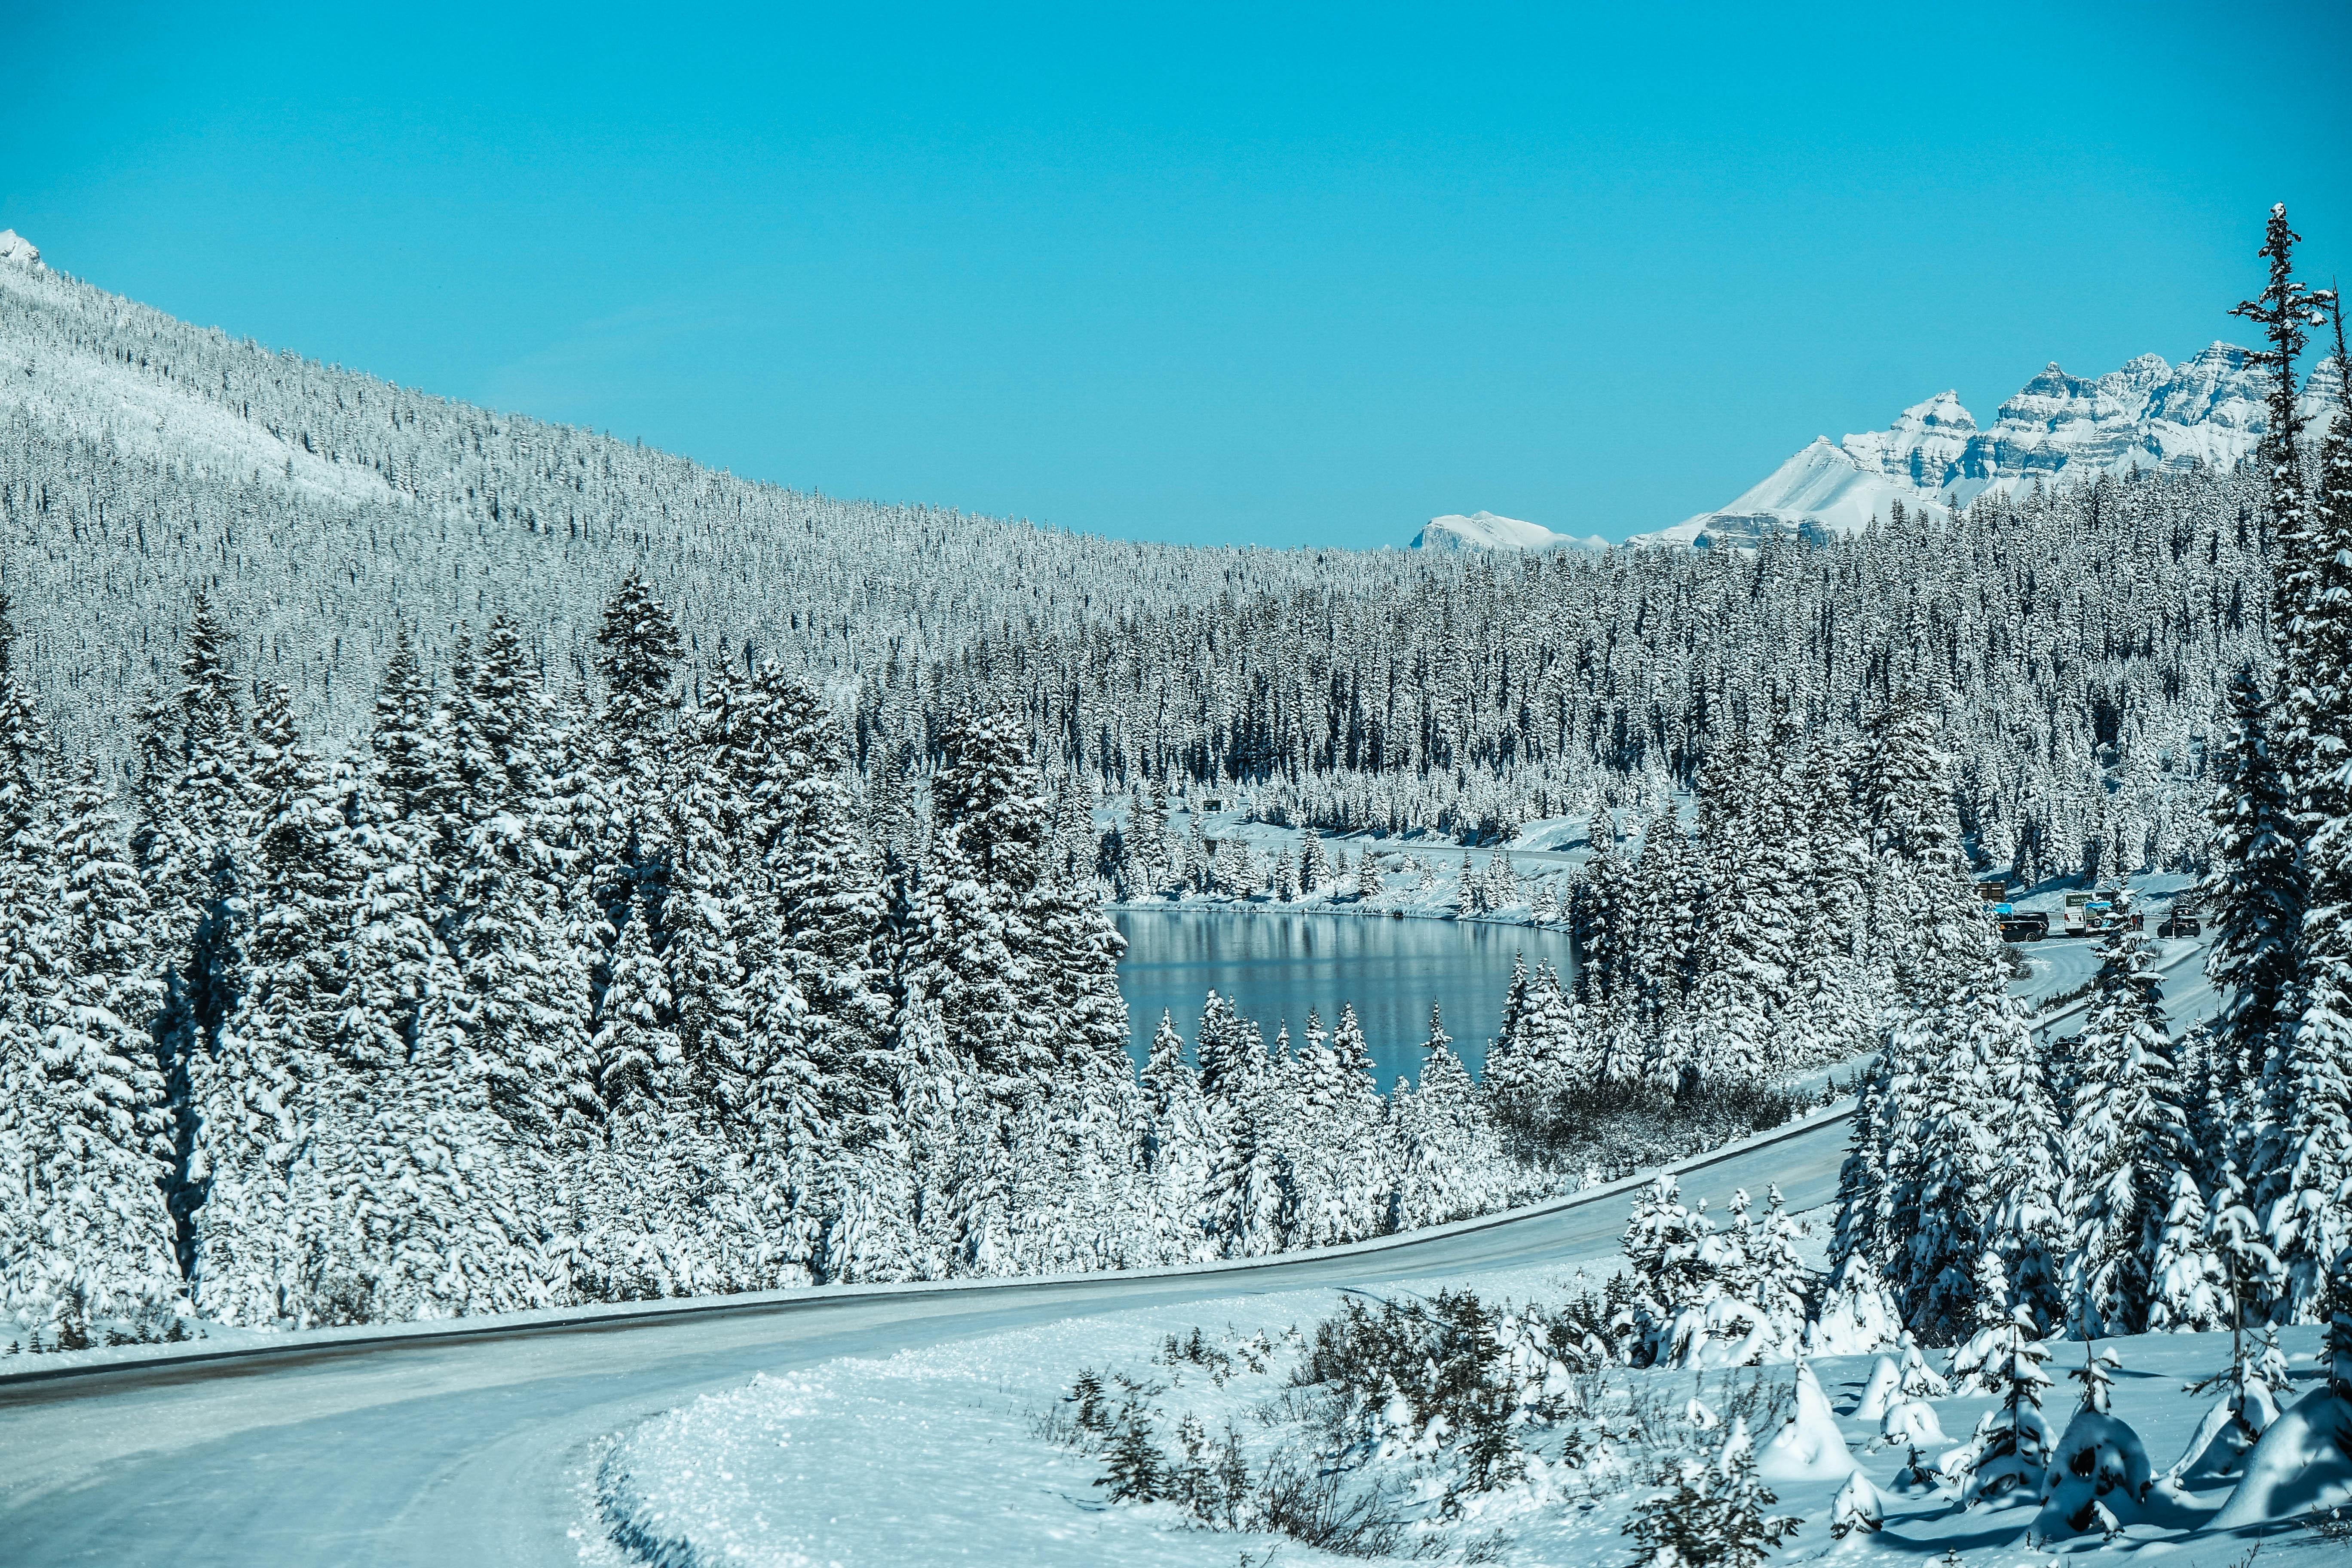 Icefield Parkway looks like Narnia